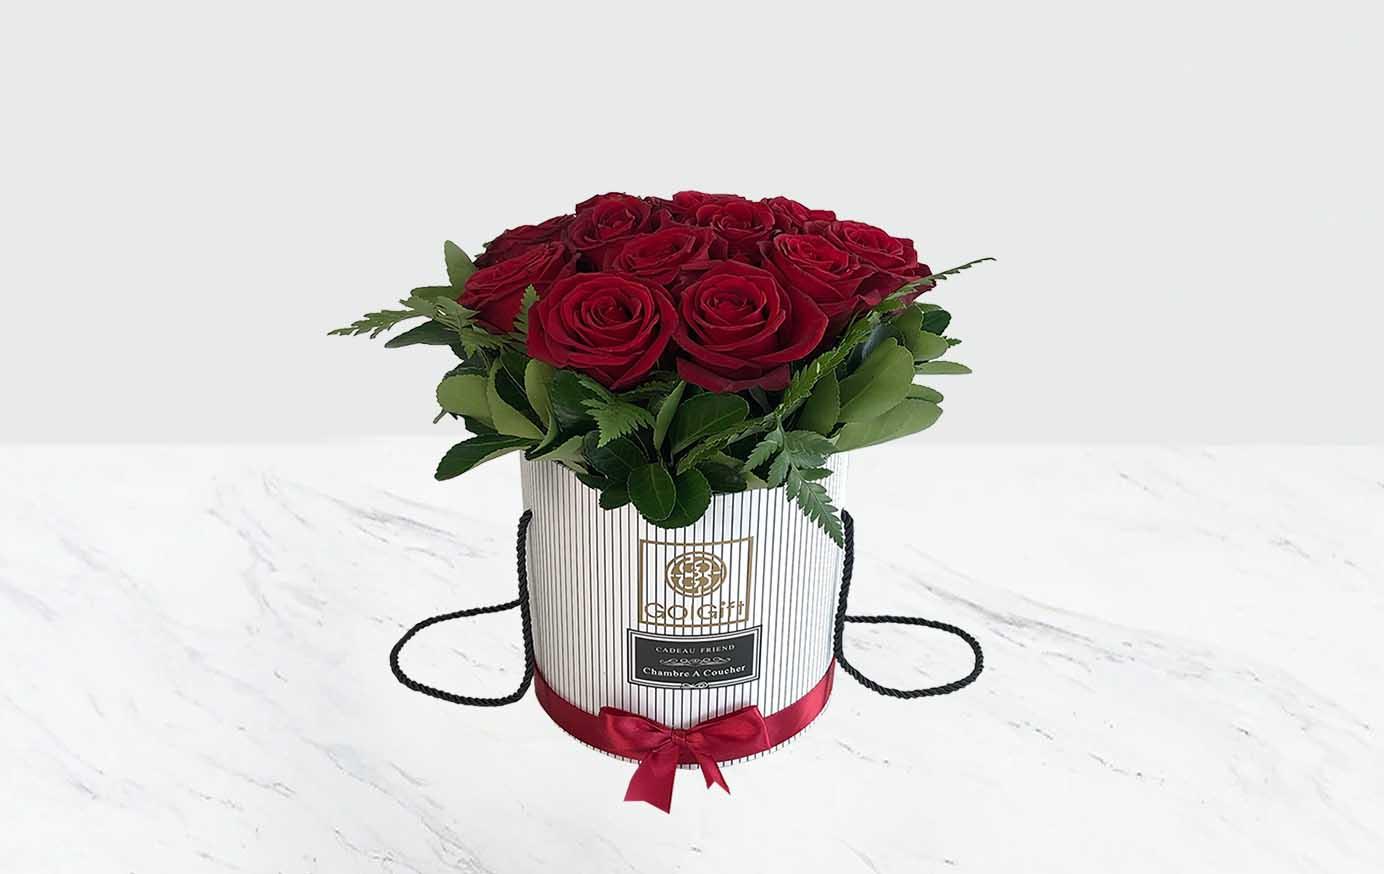 Respectful Roses